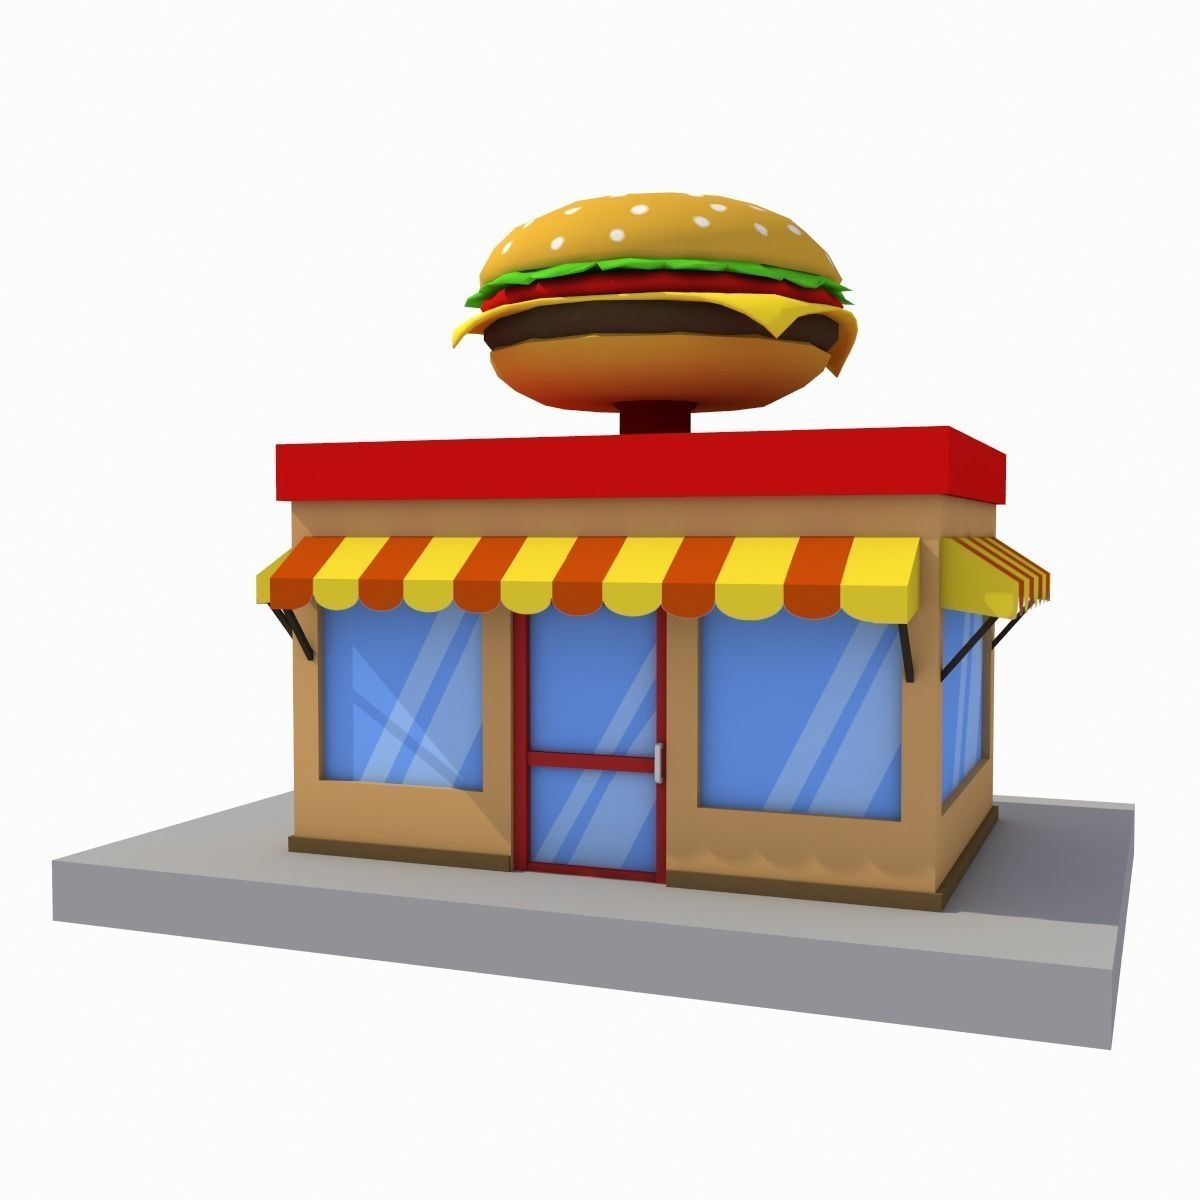 Cartoon house low poly. Burger clipart building